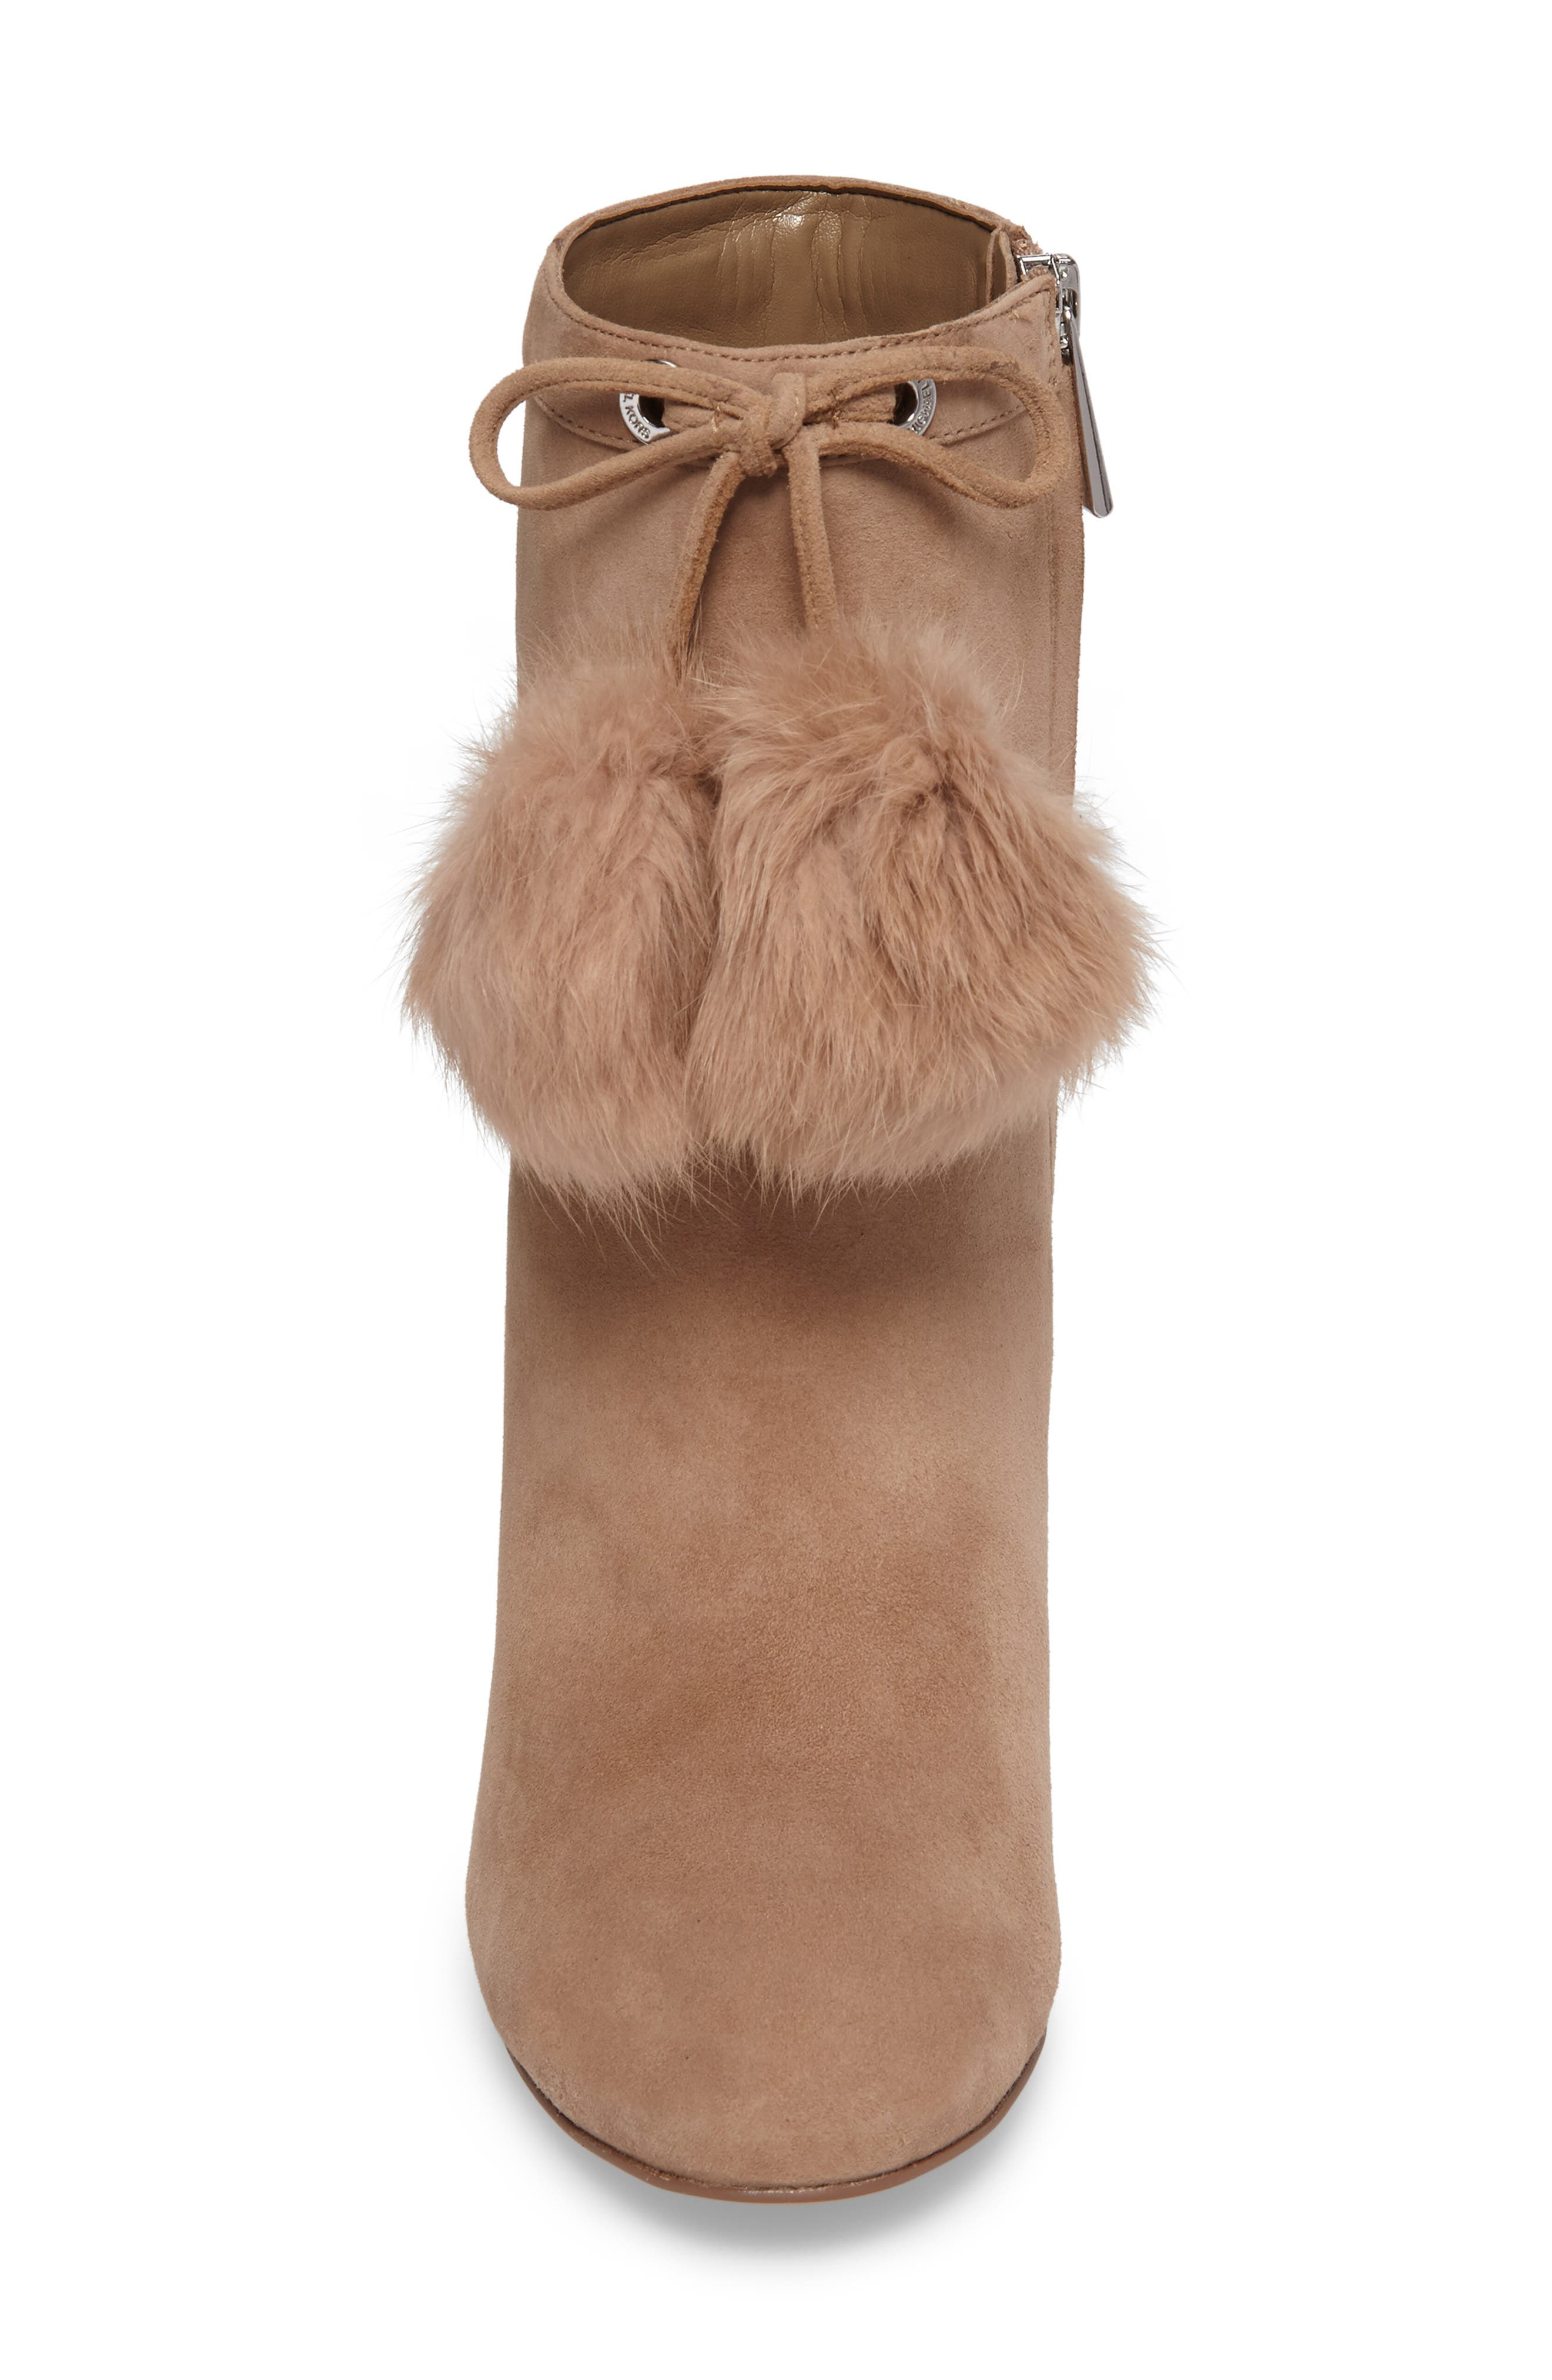 Remi Bootie with Genuine Rabbit Fur Pom,                             Alternate thumbnail 8, color,